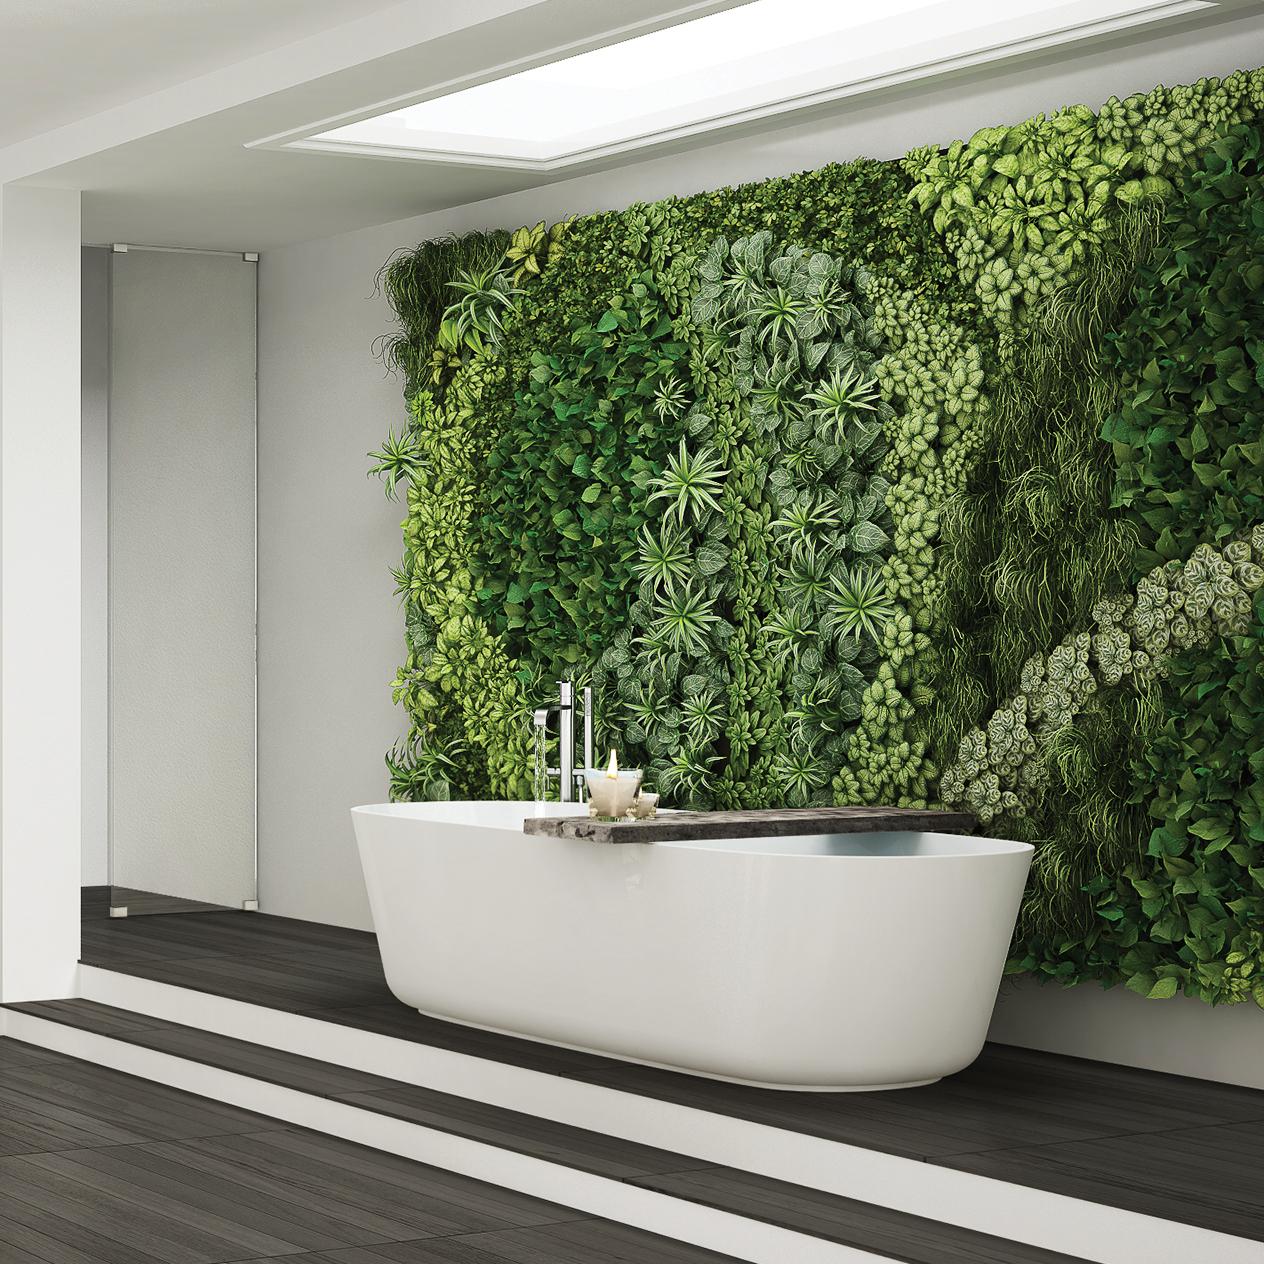 Walls With A Vertical Garden